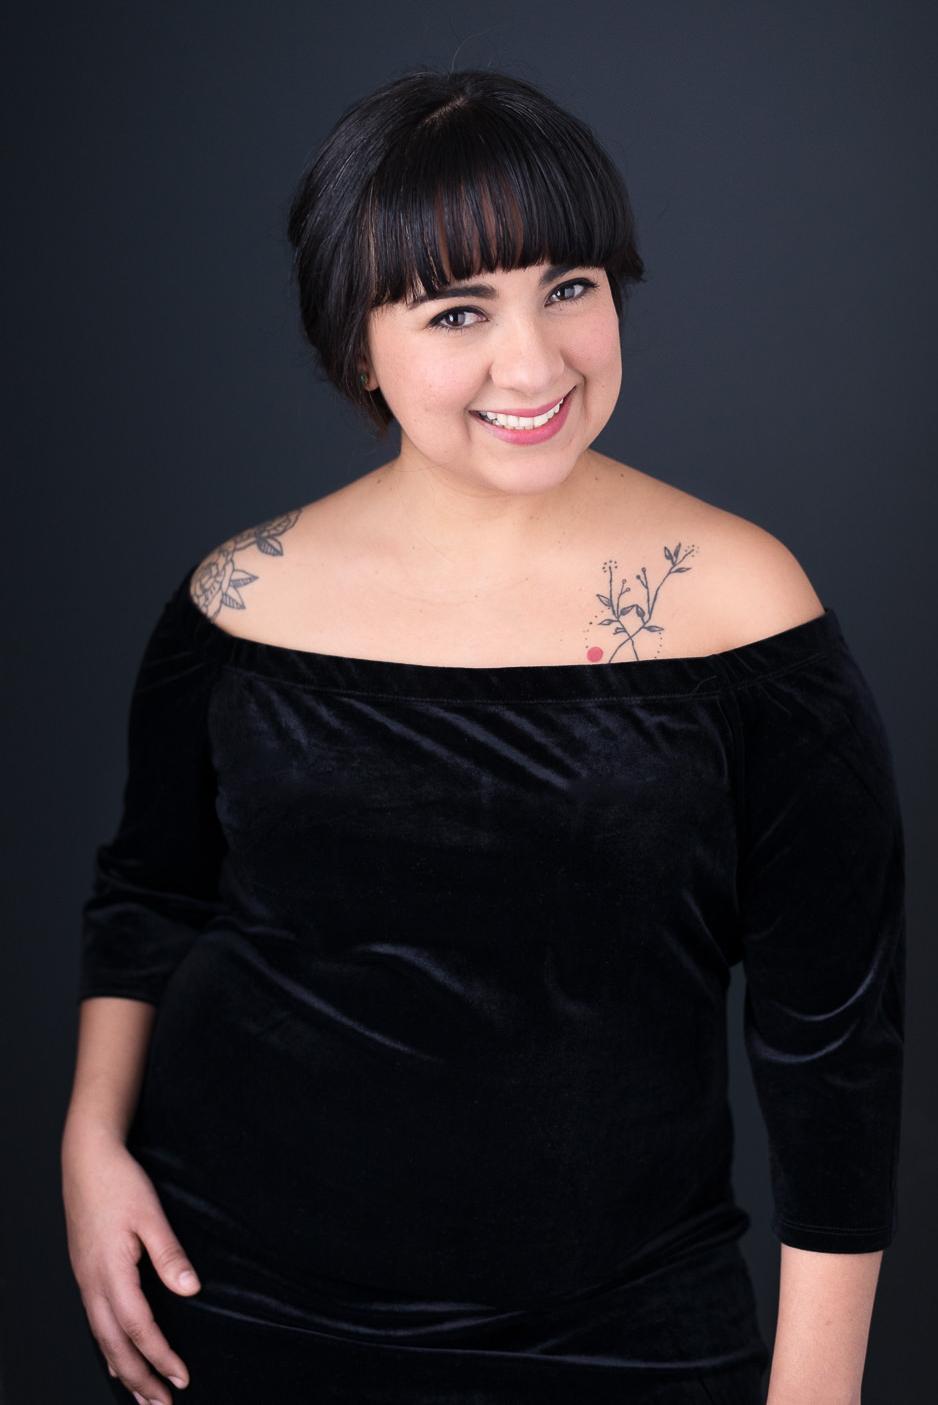 Claudia Ramirez-Melissa Alcantar Fotografia Sesión de fotos